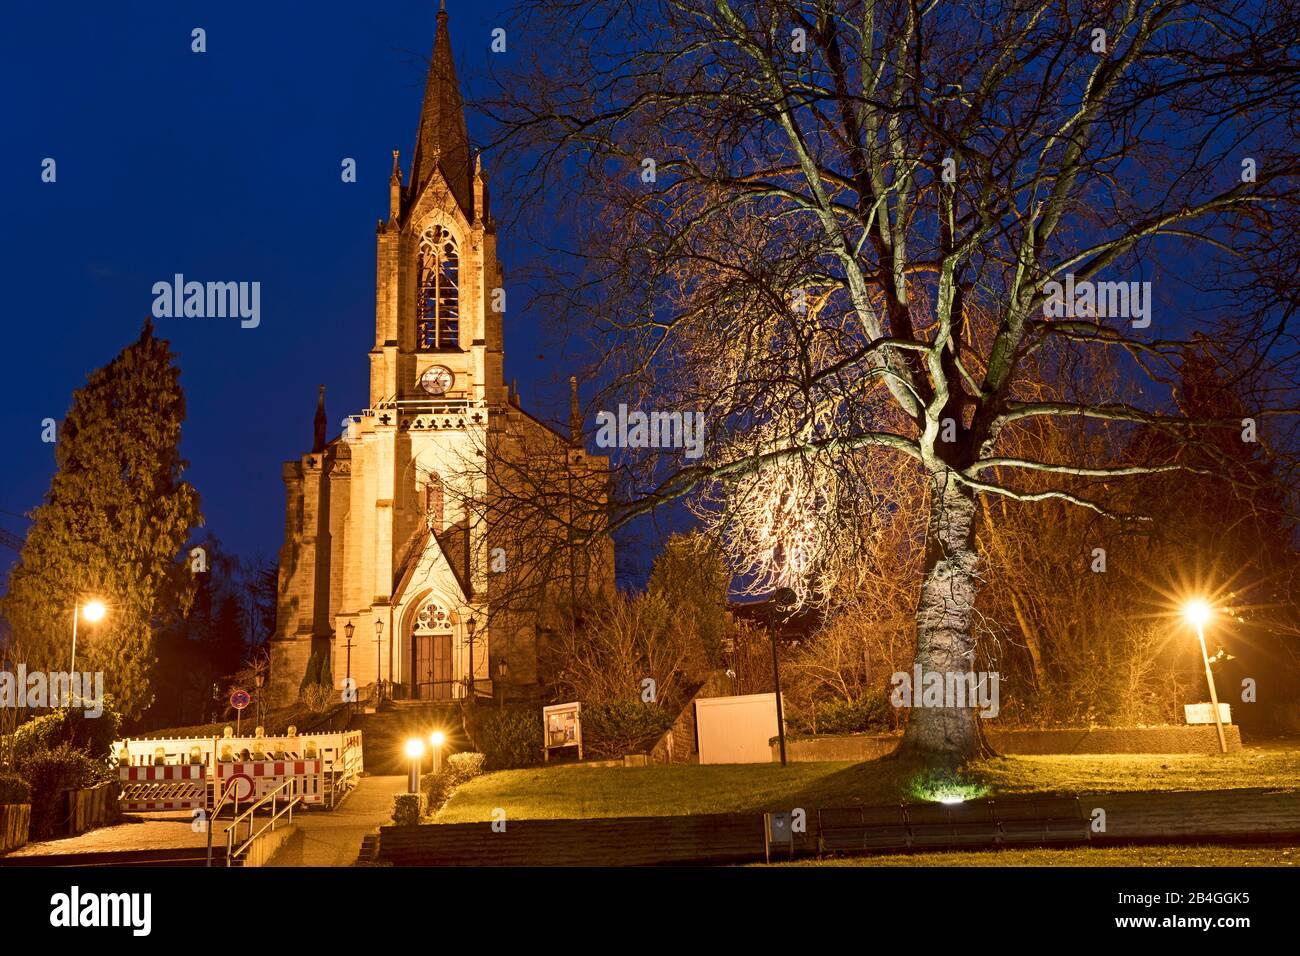 Christuskirche, Heure Bleue, Bad Pyrmont, Weserbergland, Basse-Saxe, Allemagne, Europe Banque D'Images